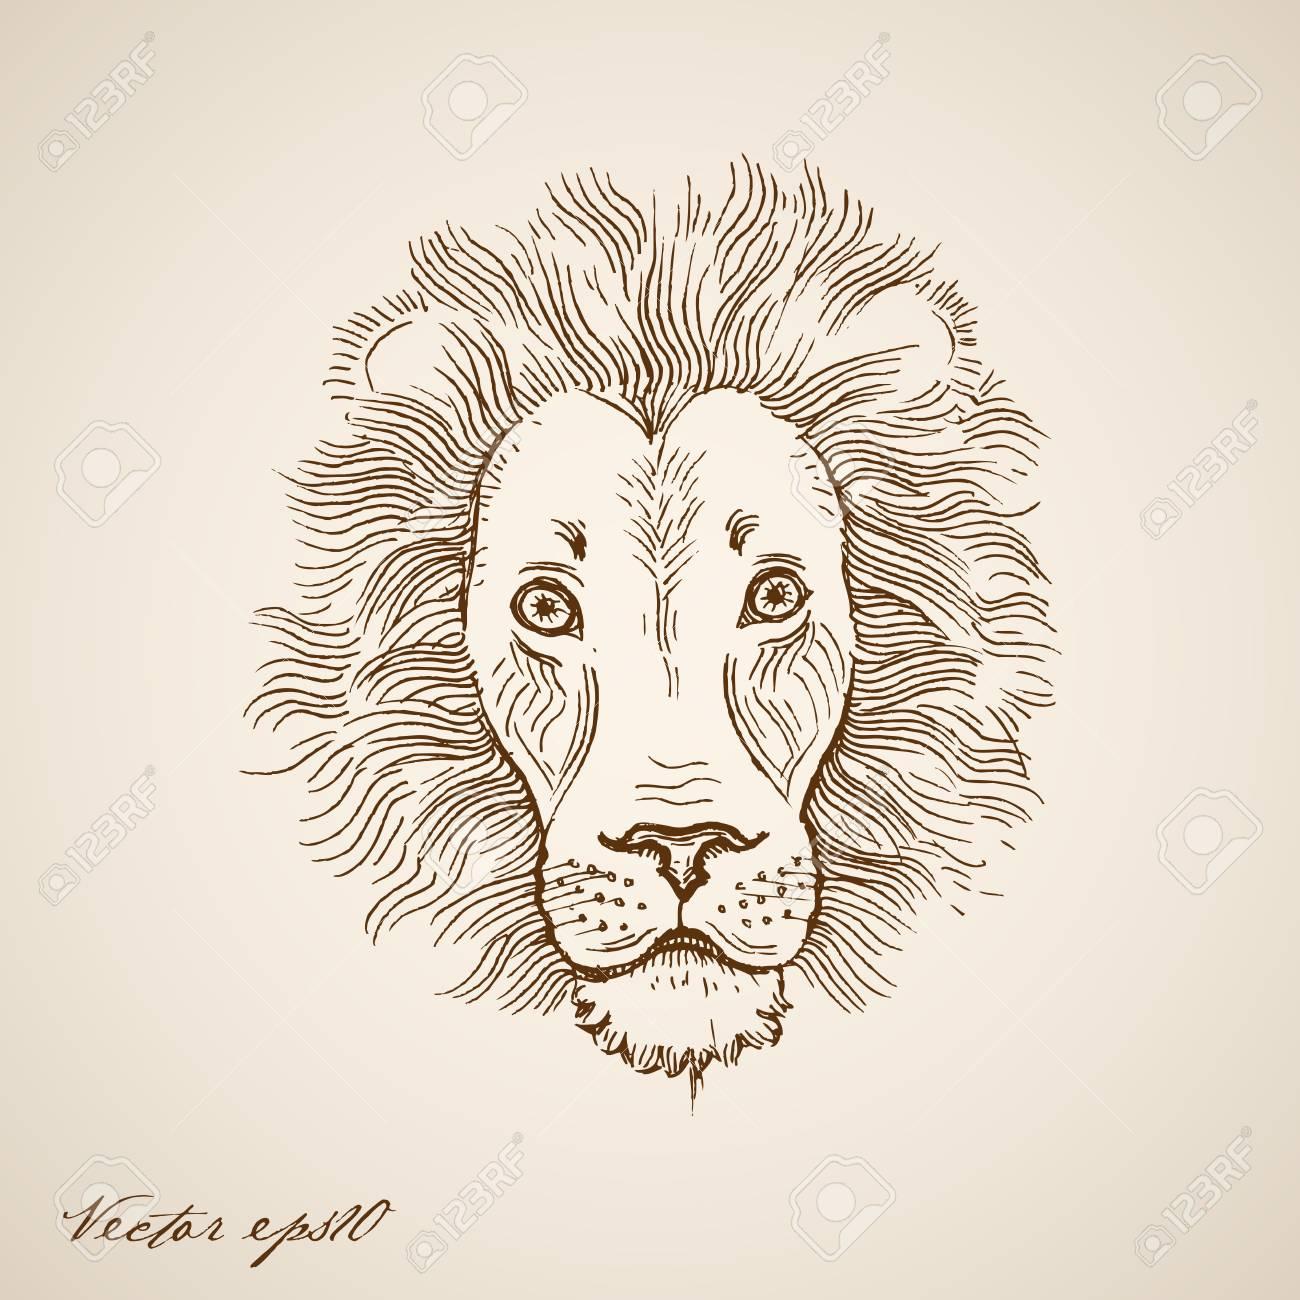 Engraving vintage hand drawn lion doodle collage pencil sketch